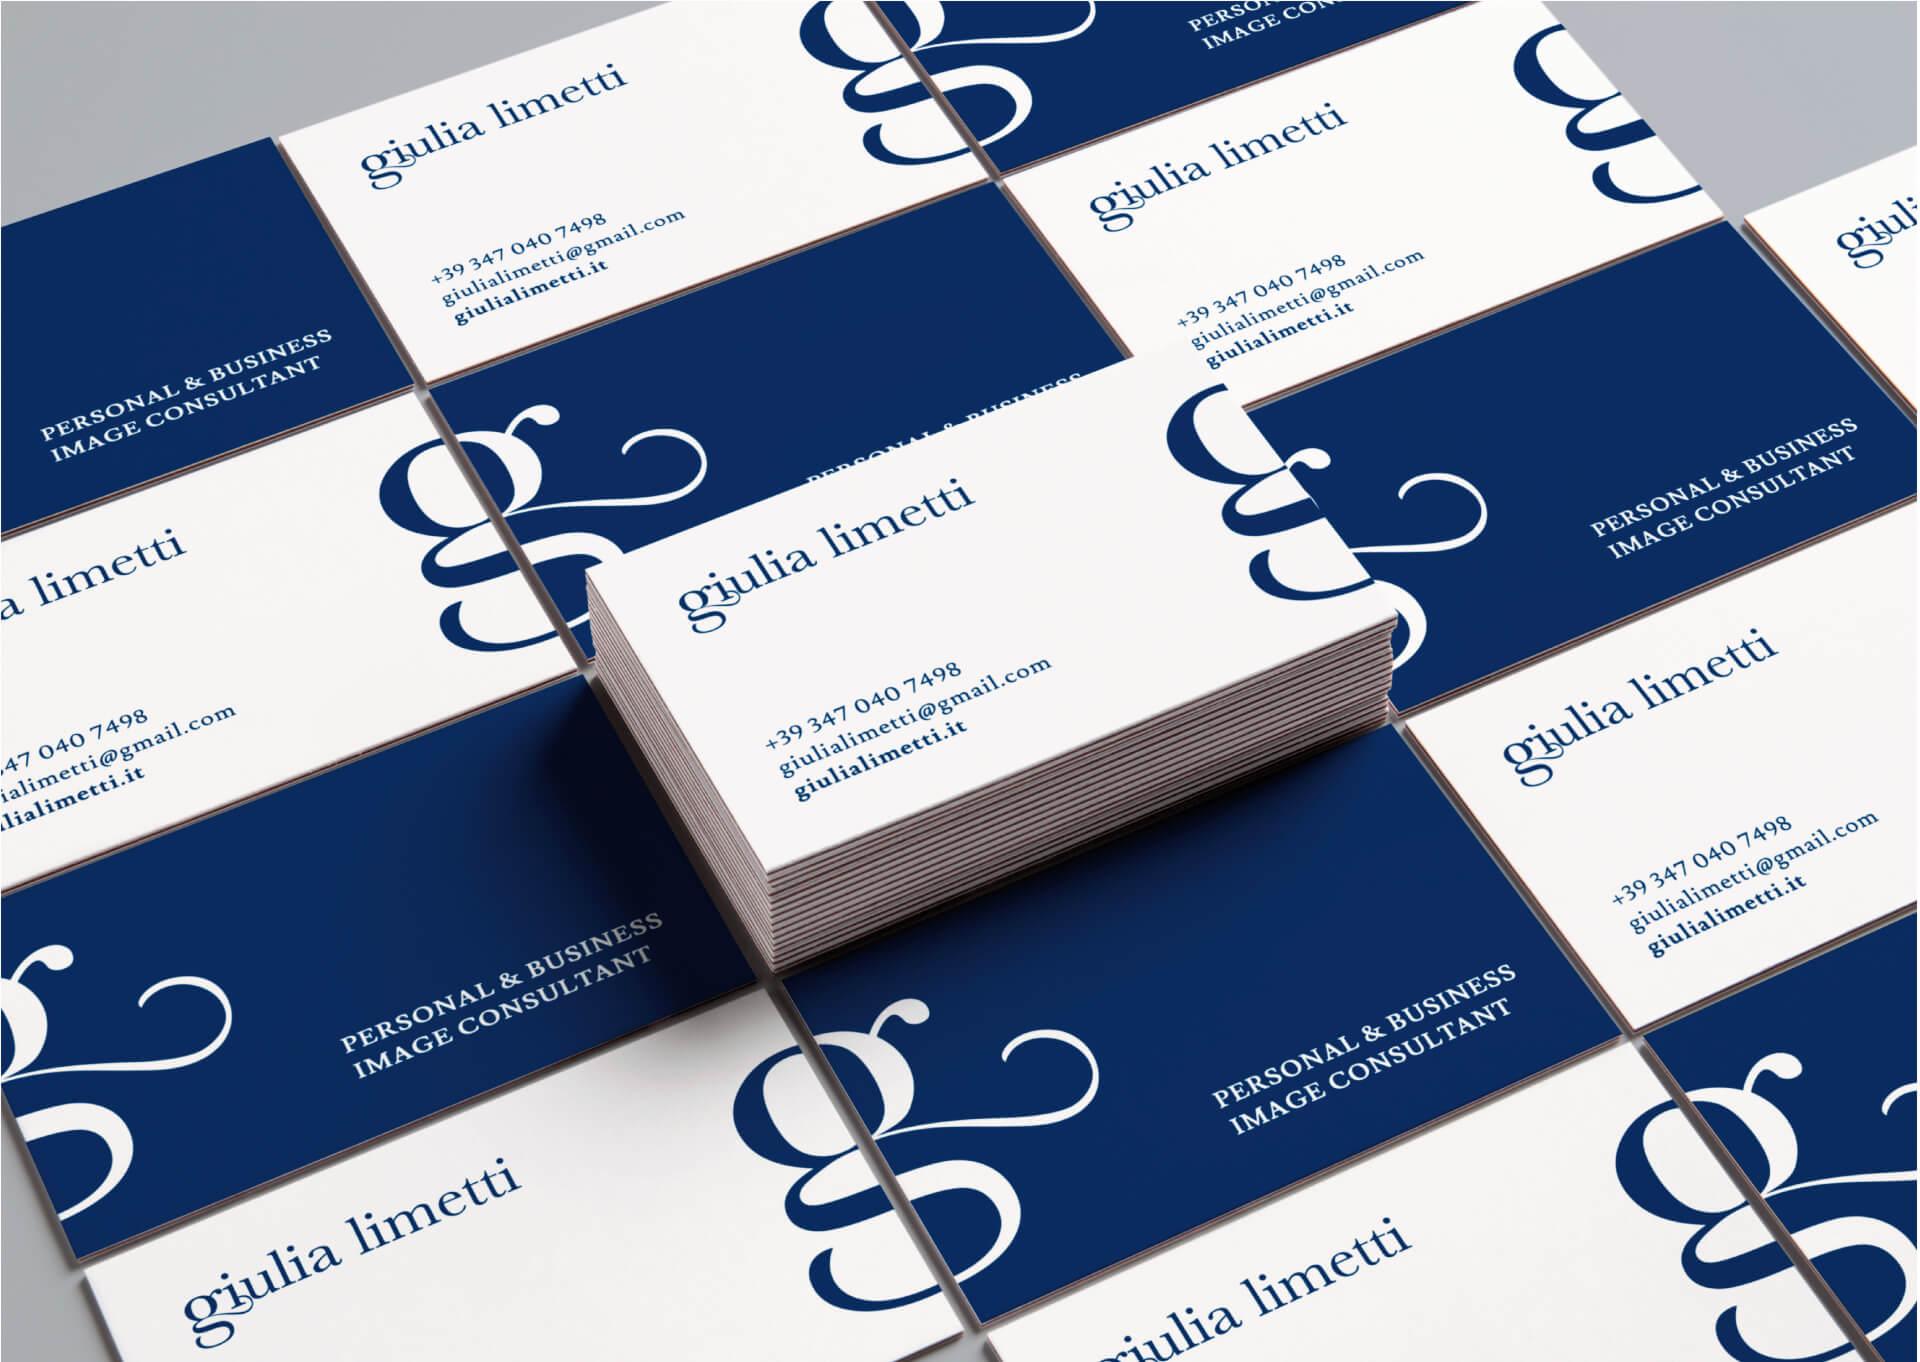 Giulia-Limetti-logo-03